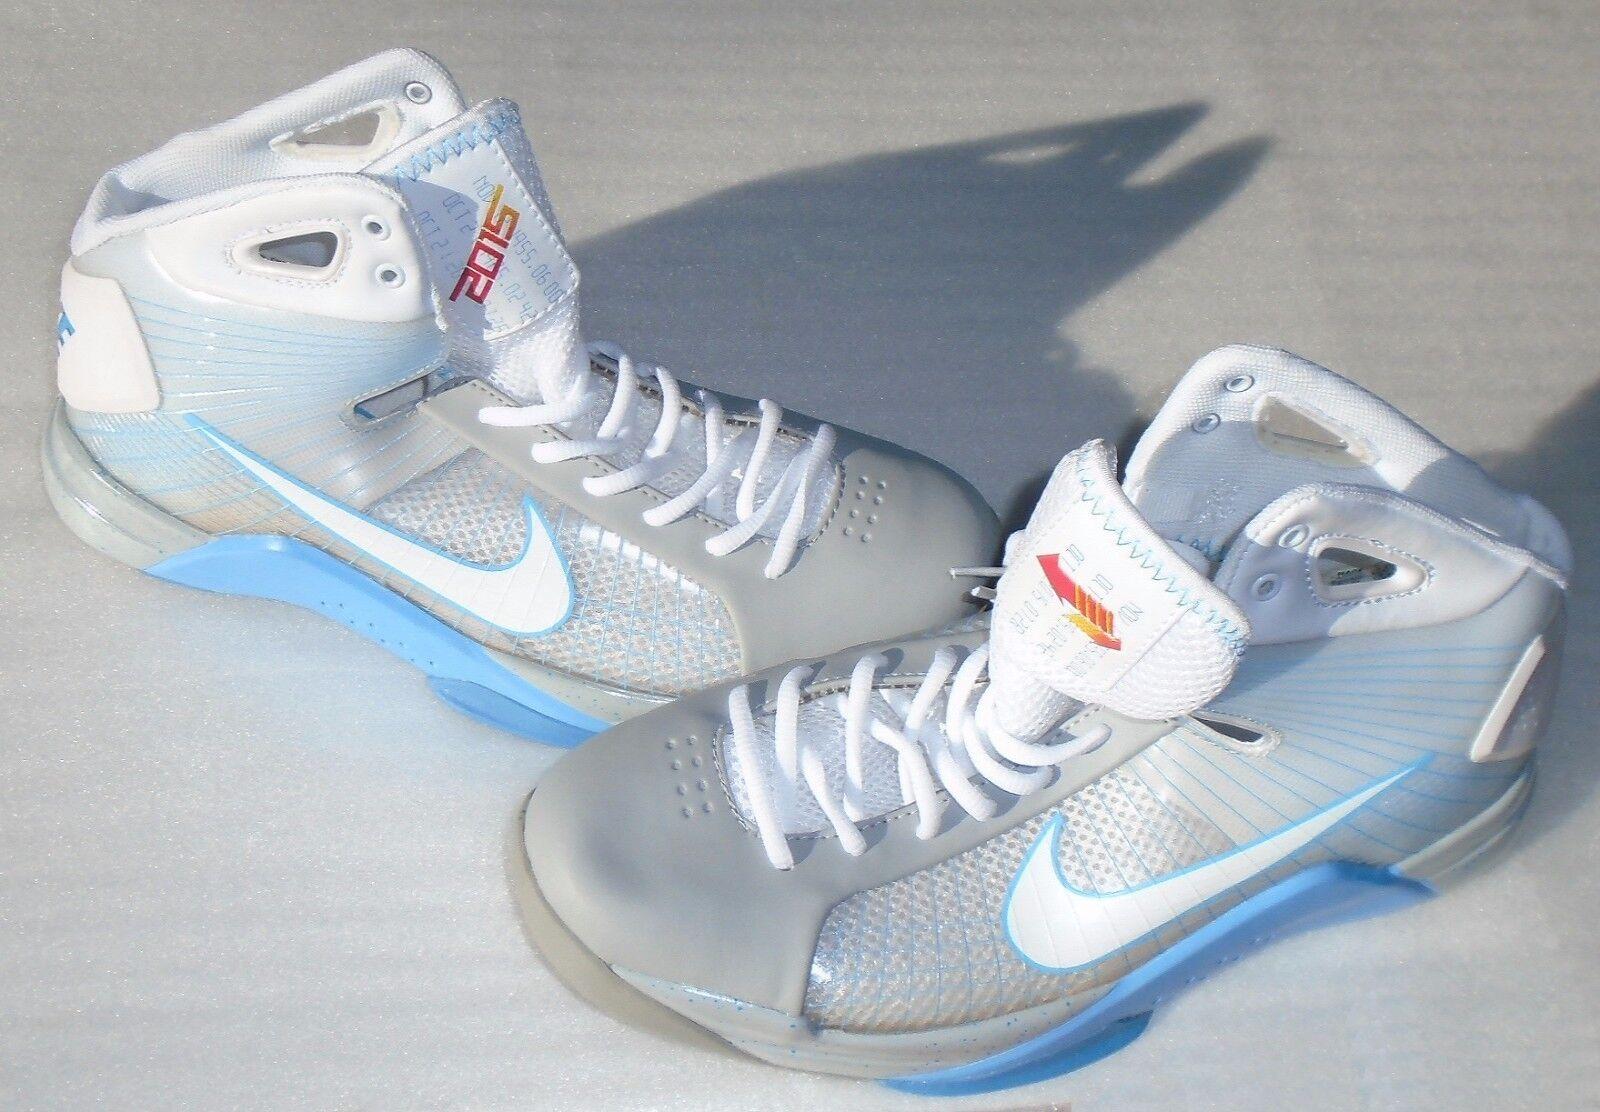 Nike Hyperdunk Marty McFly Trainers Size U.S. Size 10 ERO 44